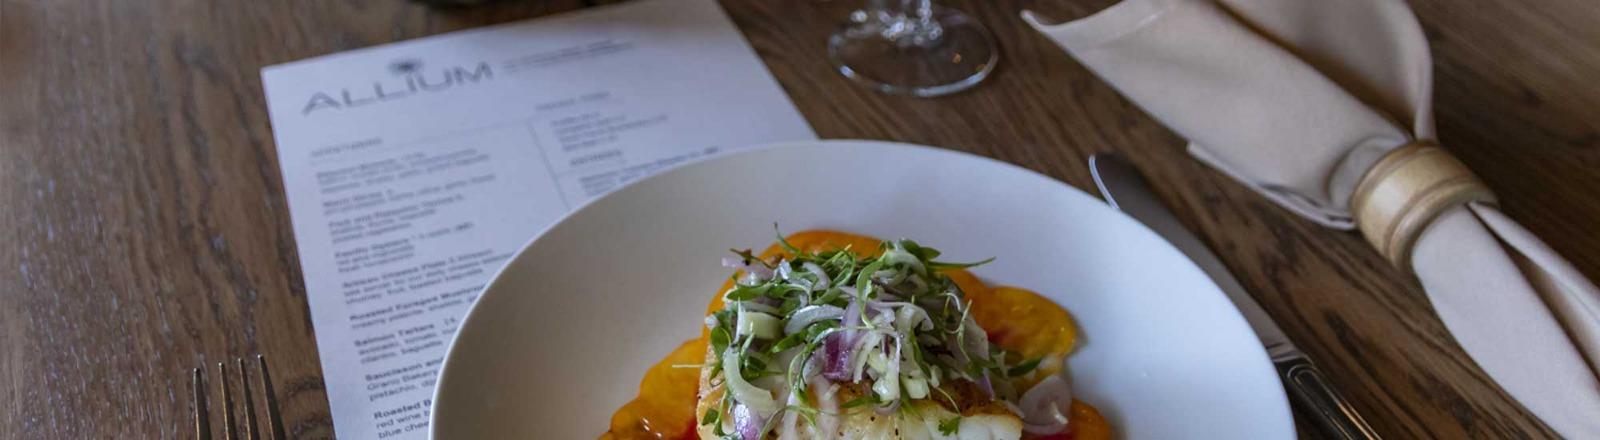 Dinner and menu Allium Bistro downtown West Linn Oregon's Mount Hood Territory